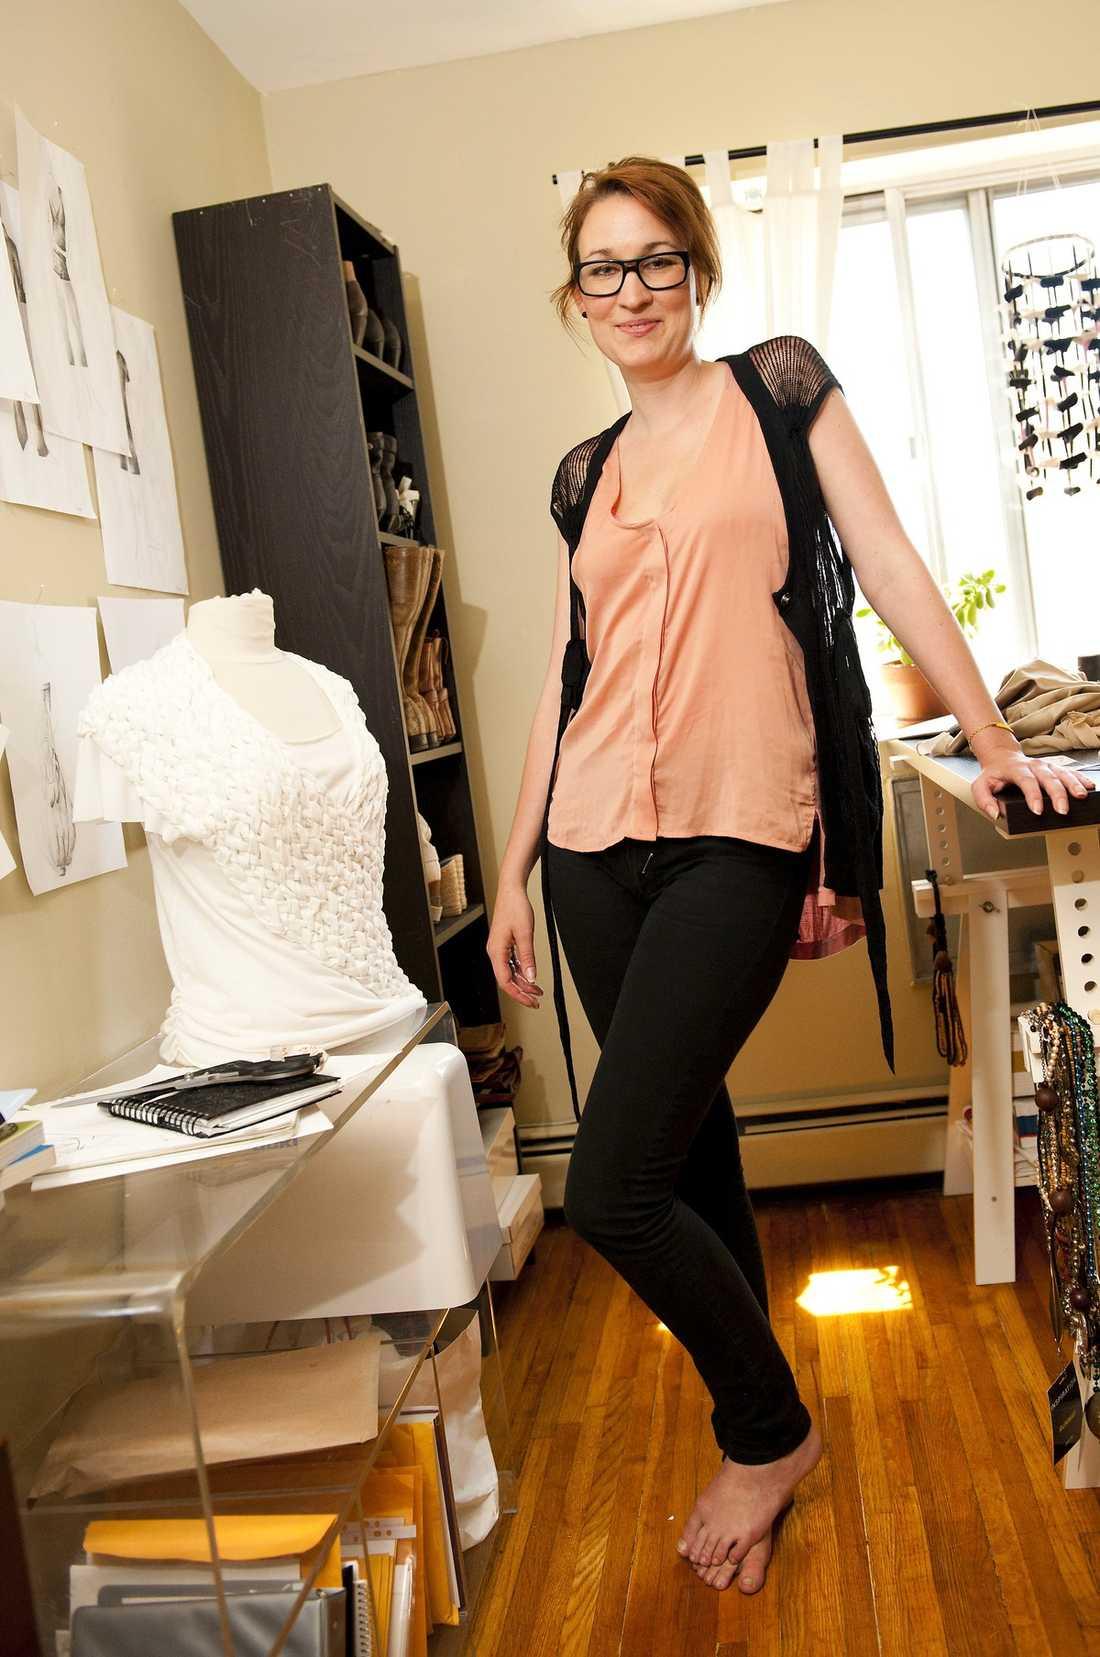 df660fc4ad9 Stina syr kläder åt Sarah Jessica Parker | Aftonbladet